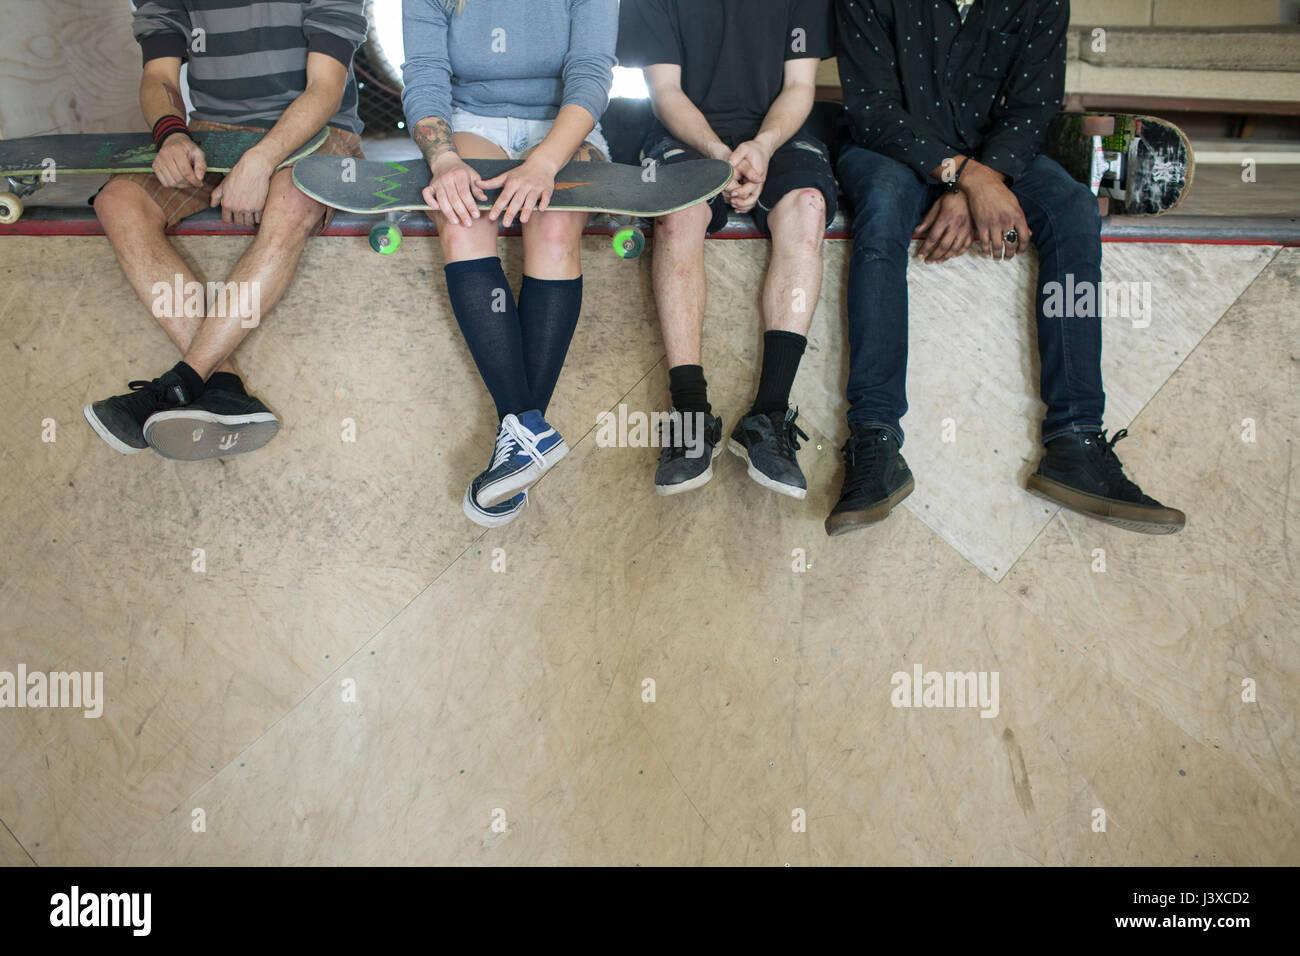 Gruppe junger Erwachsener am Eislaufplatz. Stockbild